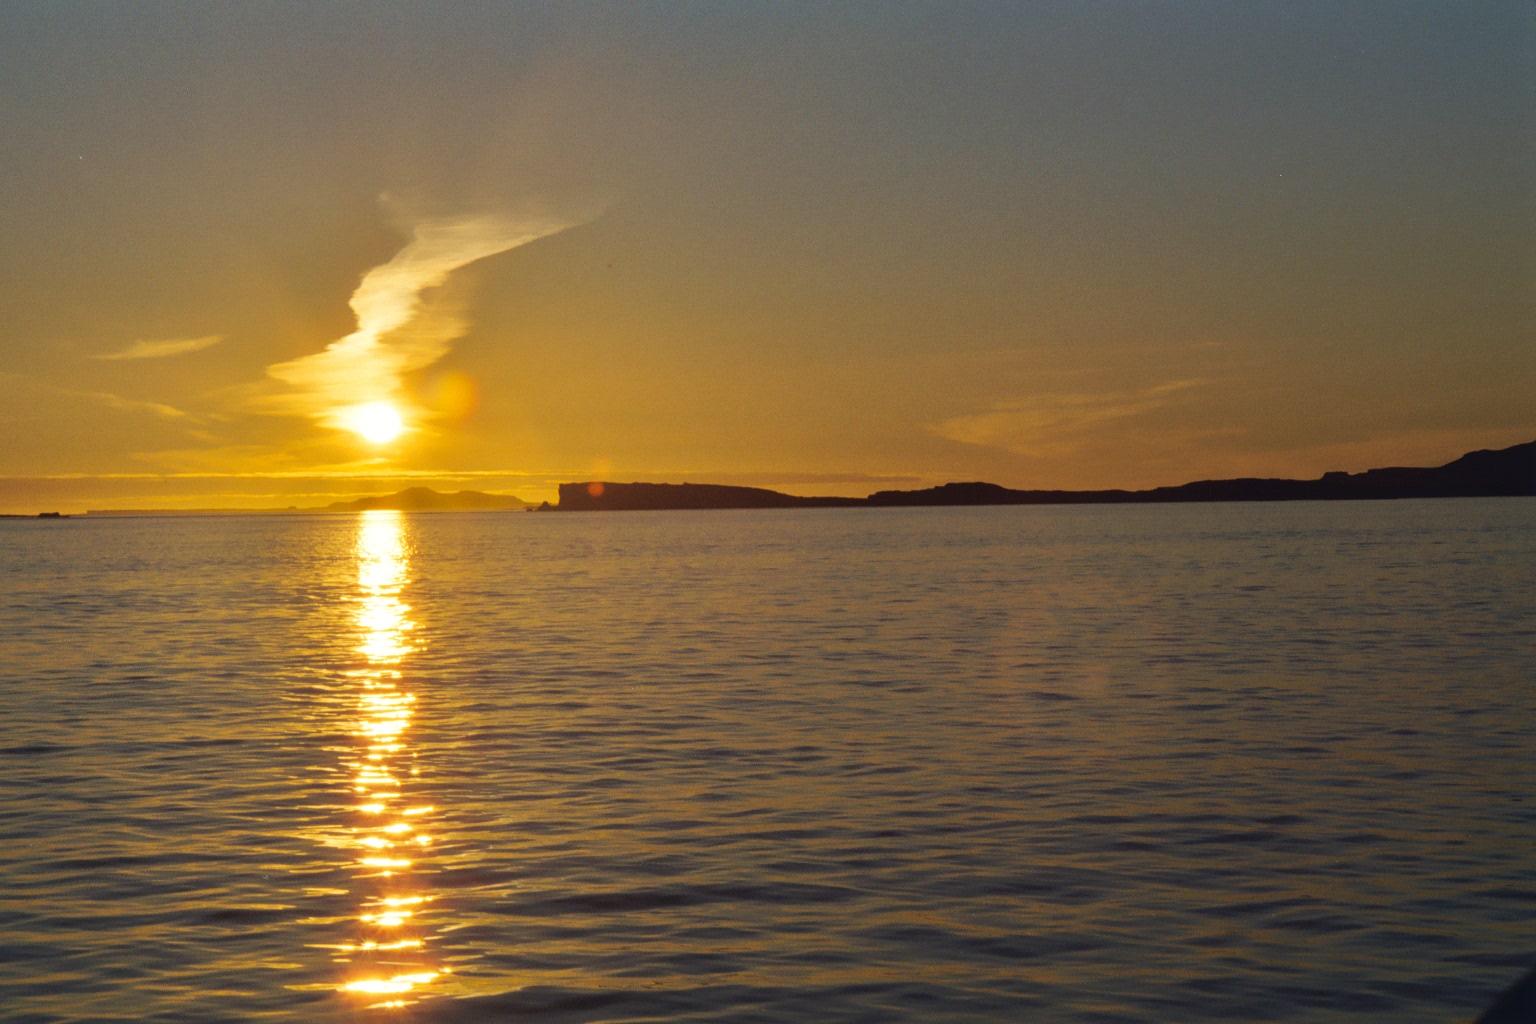 sunset_loch_na_keal